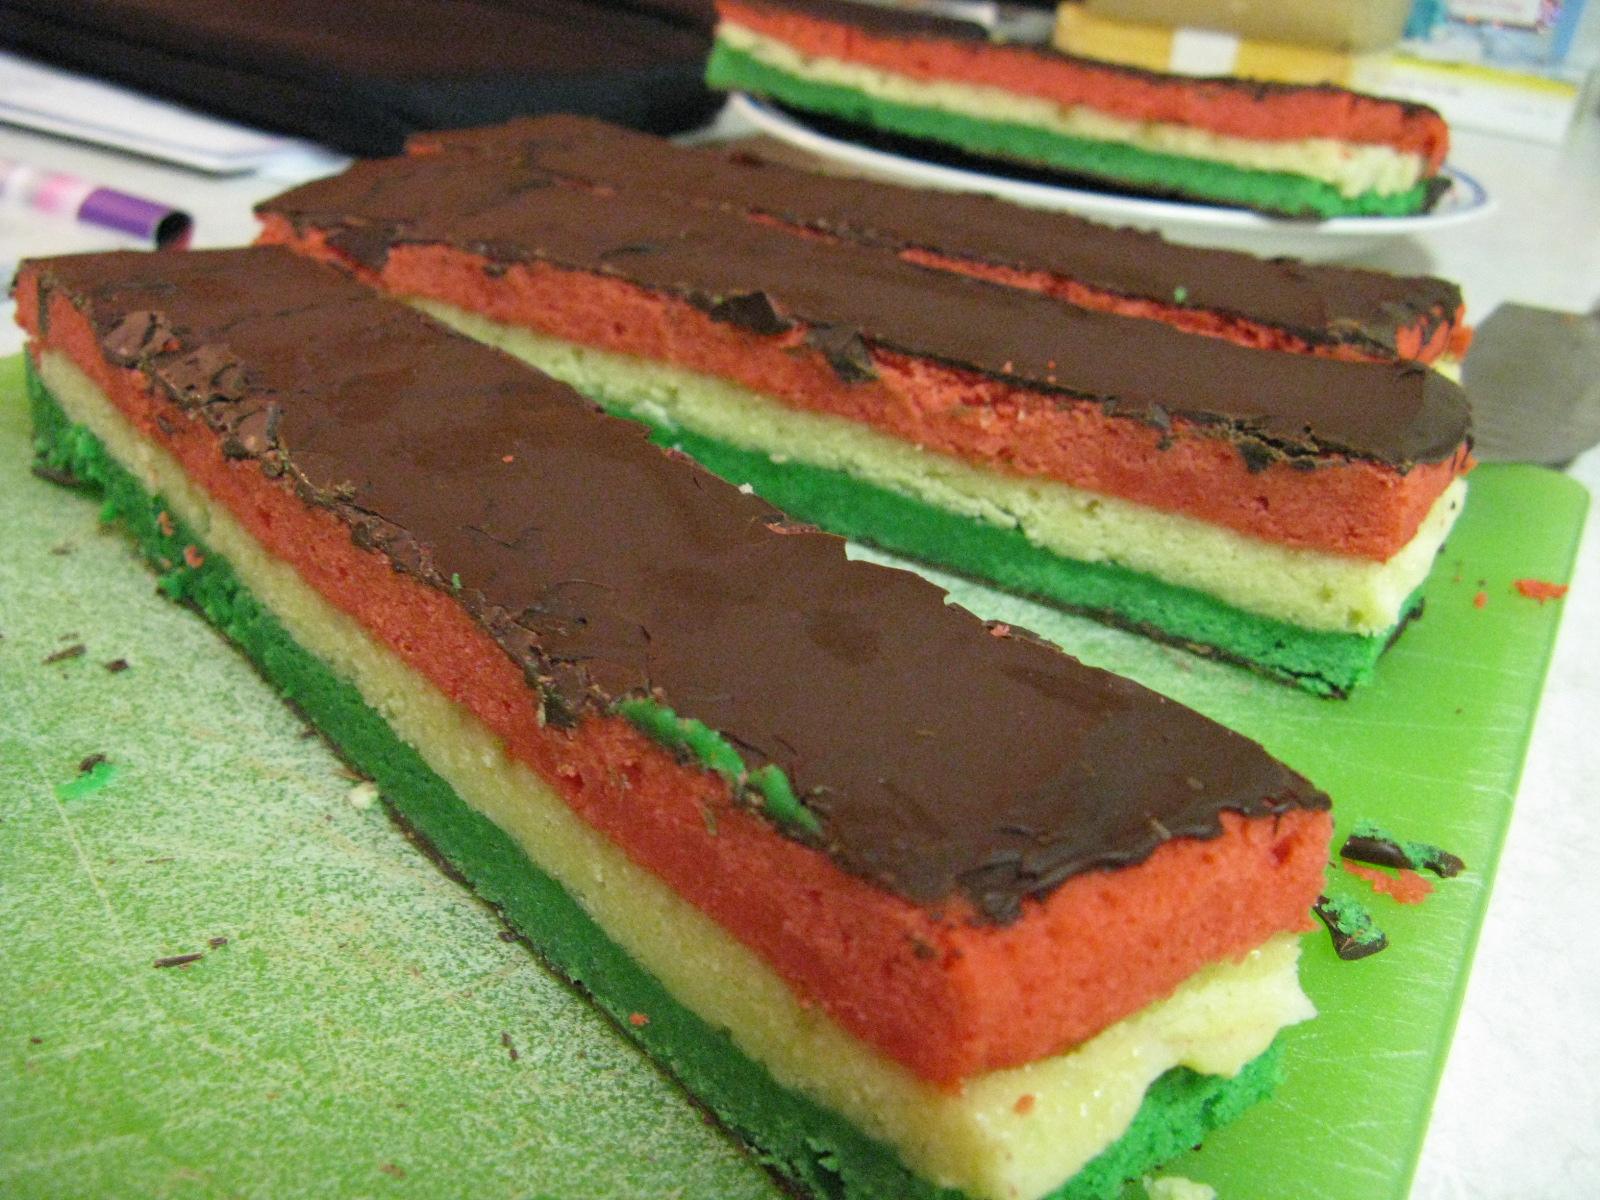 Rainbow Cake Recipe Italian: The Shortcakery: Italian Rainbow Cookies